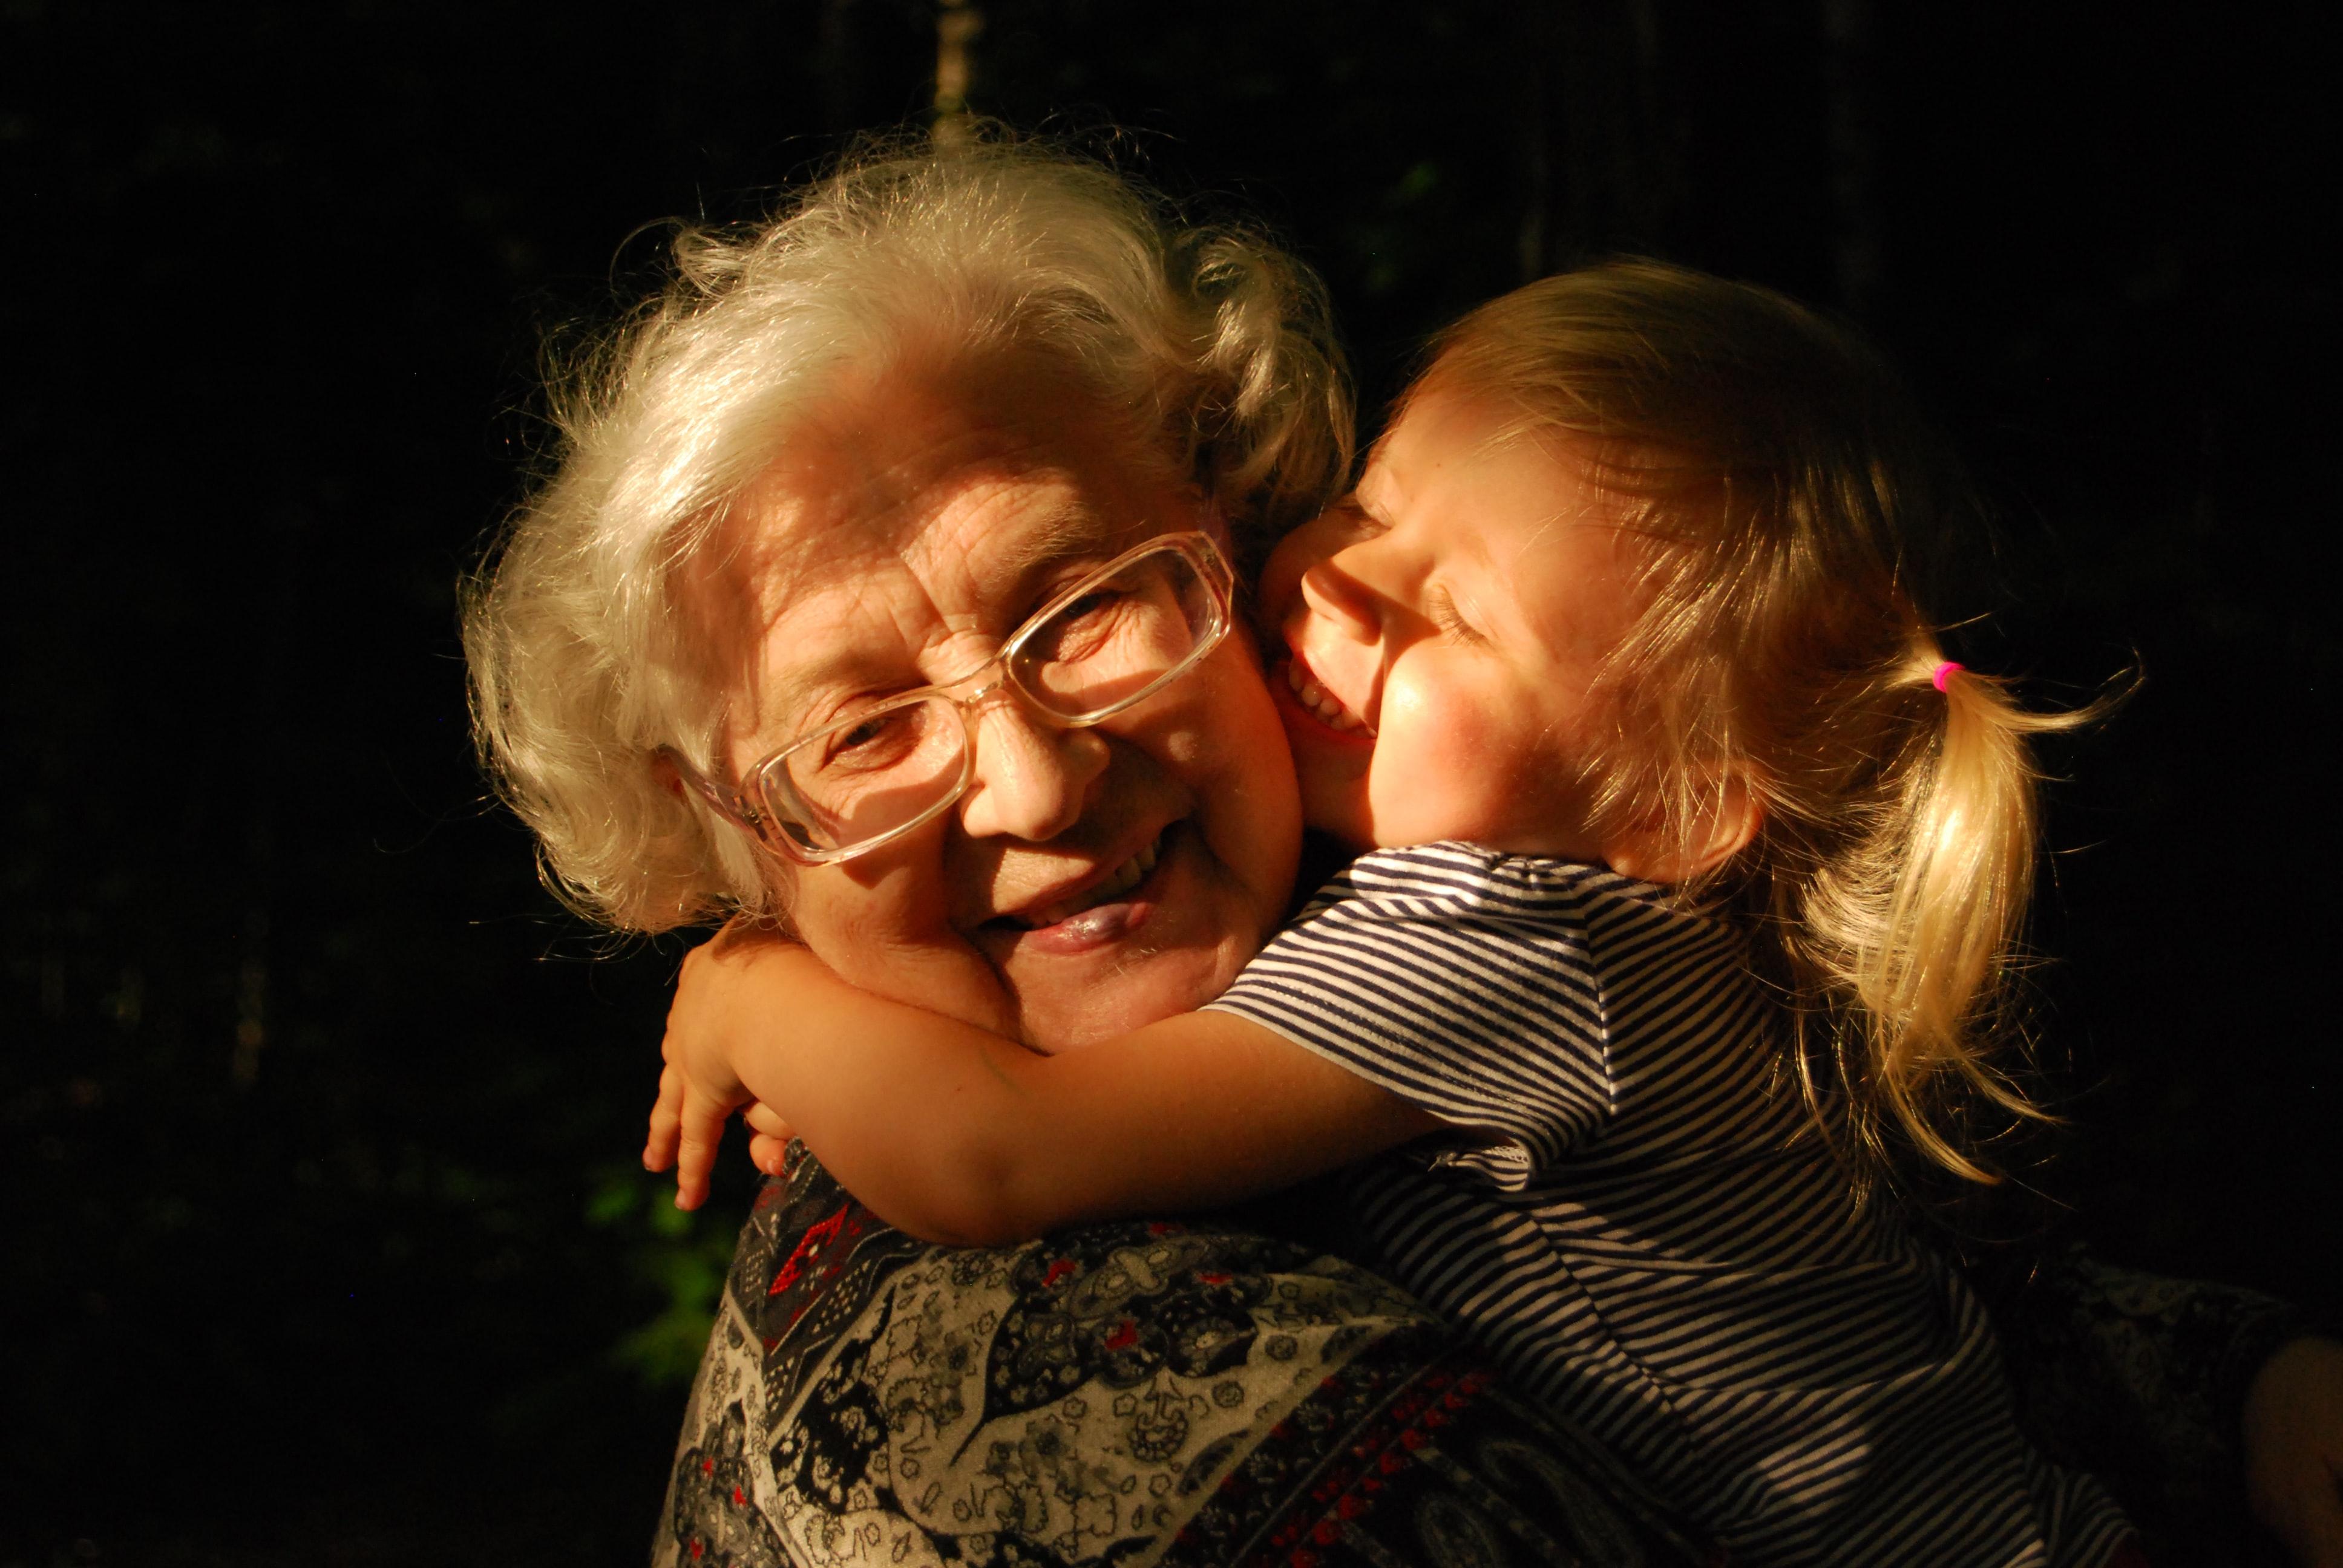 granddaughter hugging grandmother smiling